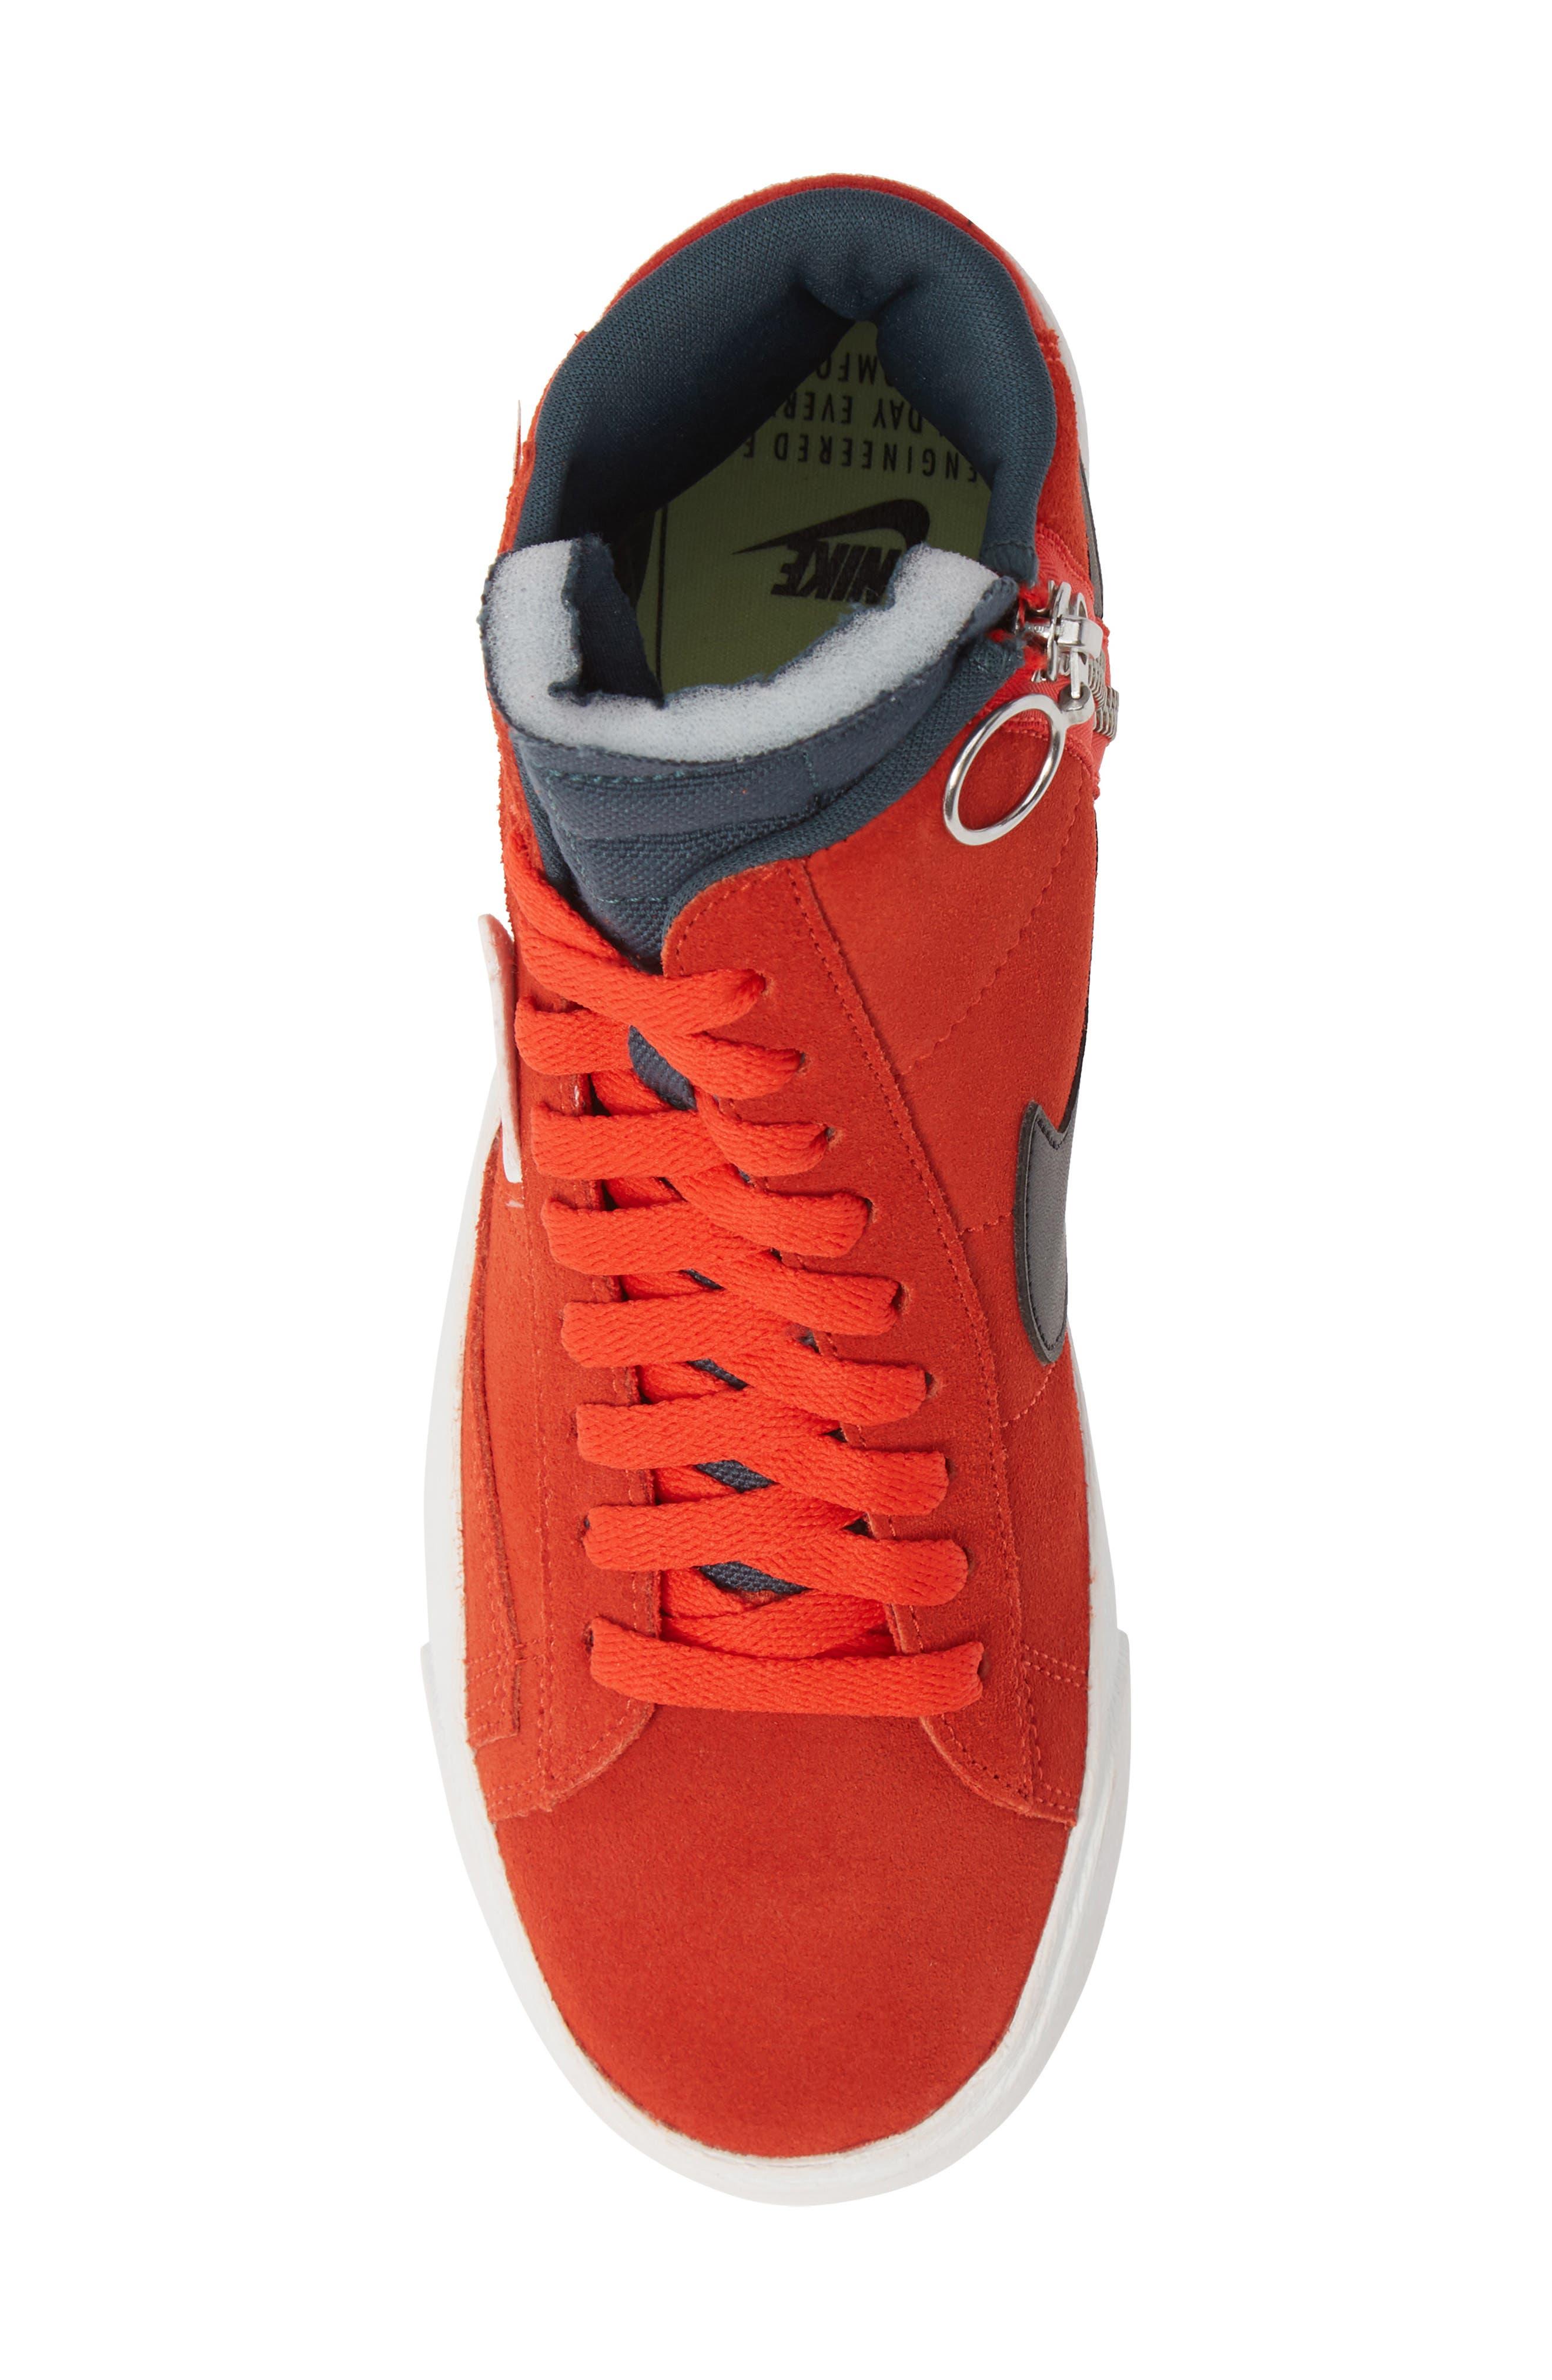 Blazer Mid Rebel Sneaker,                             Alternate thumbnail 5, color,                             HABANERO/ WHITE/ BLACK/ SPRUCE